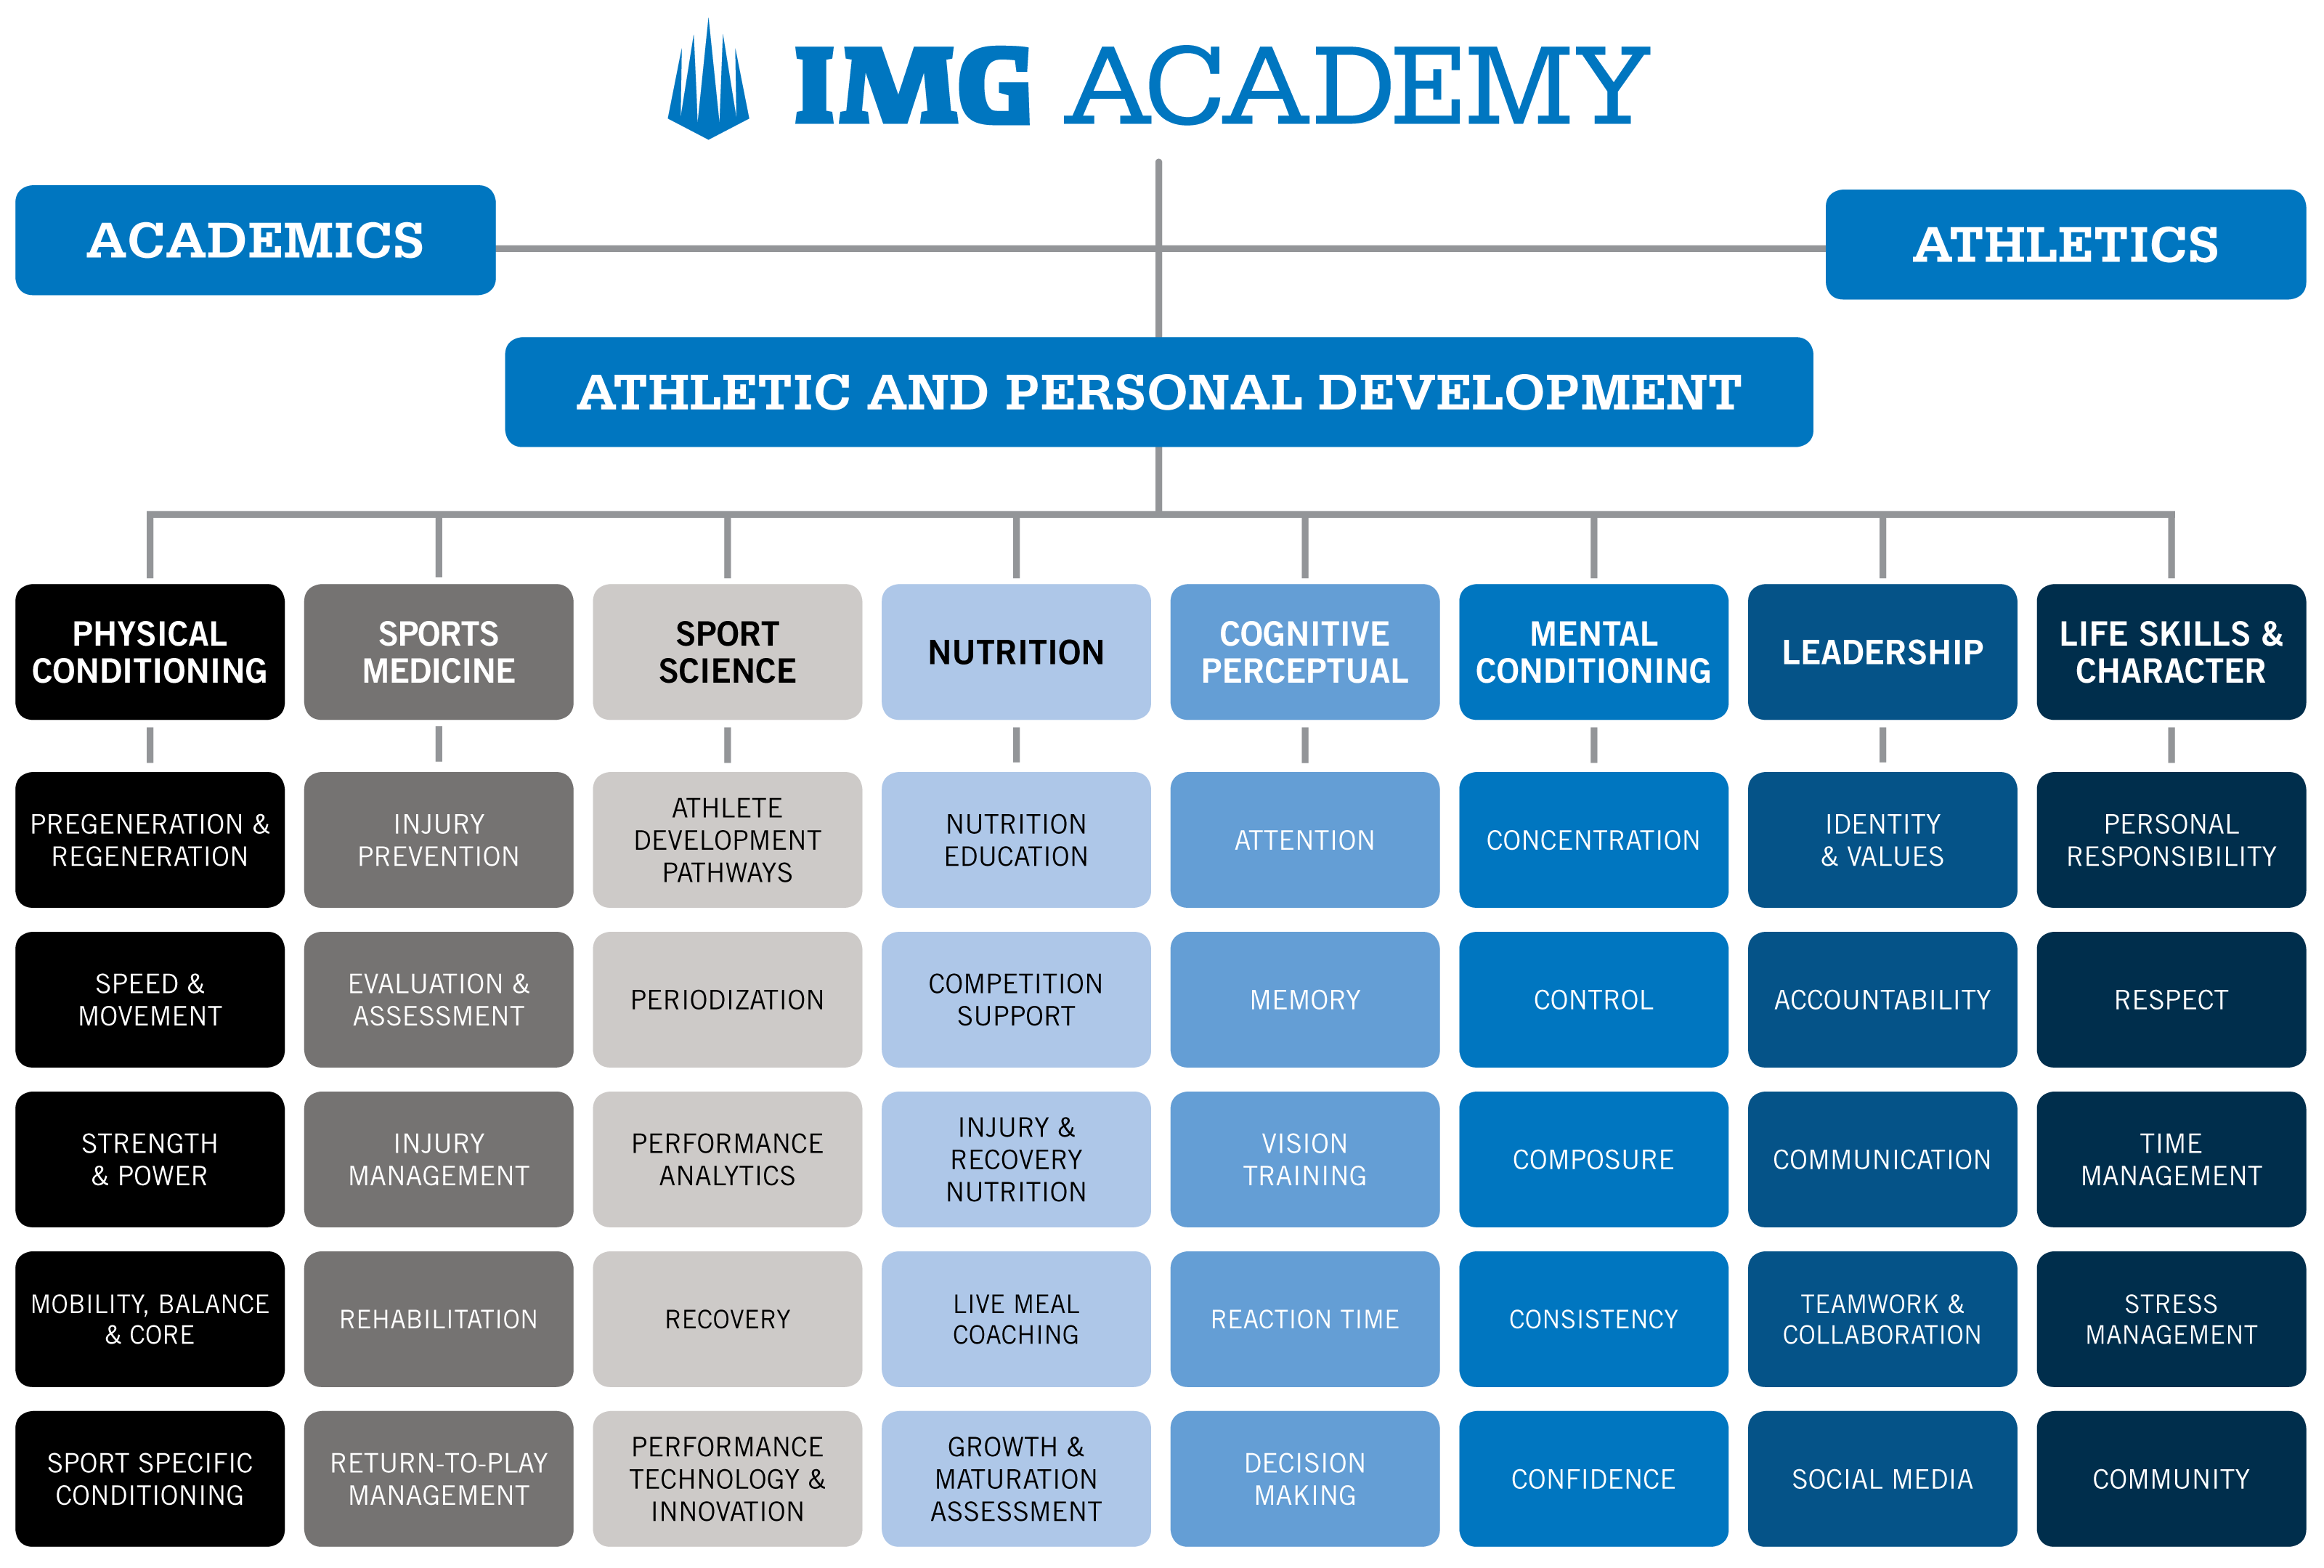 Athletic Performance Academy - Athletic Performance Program